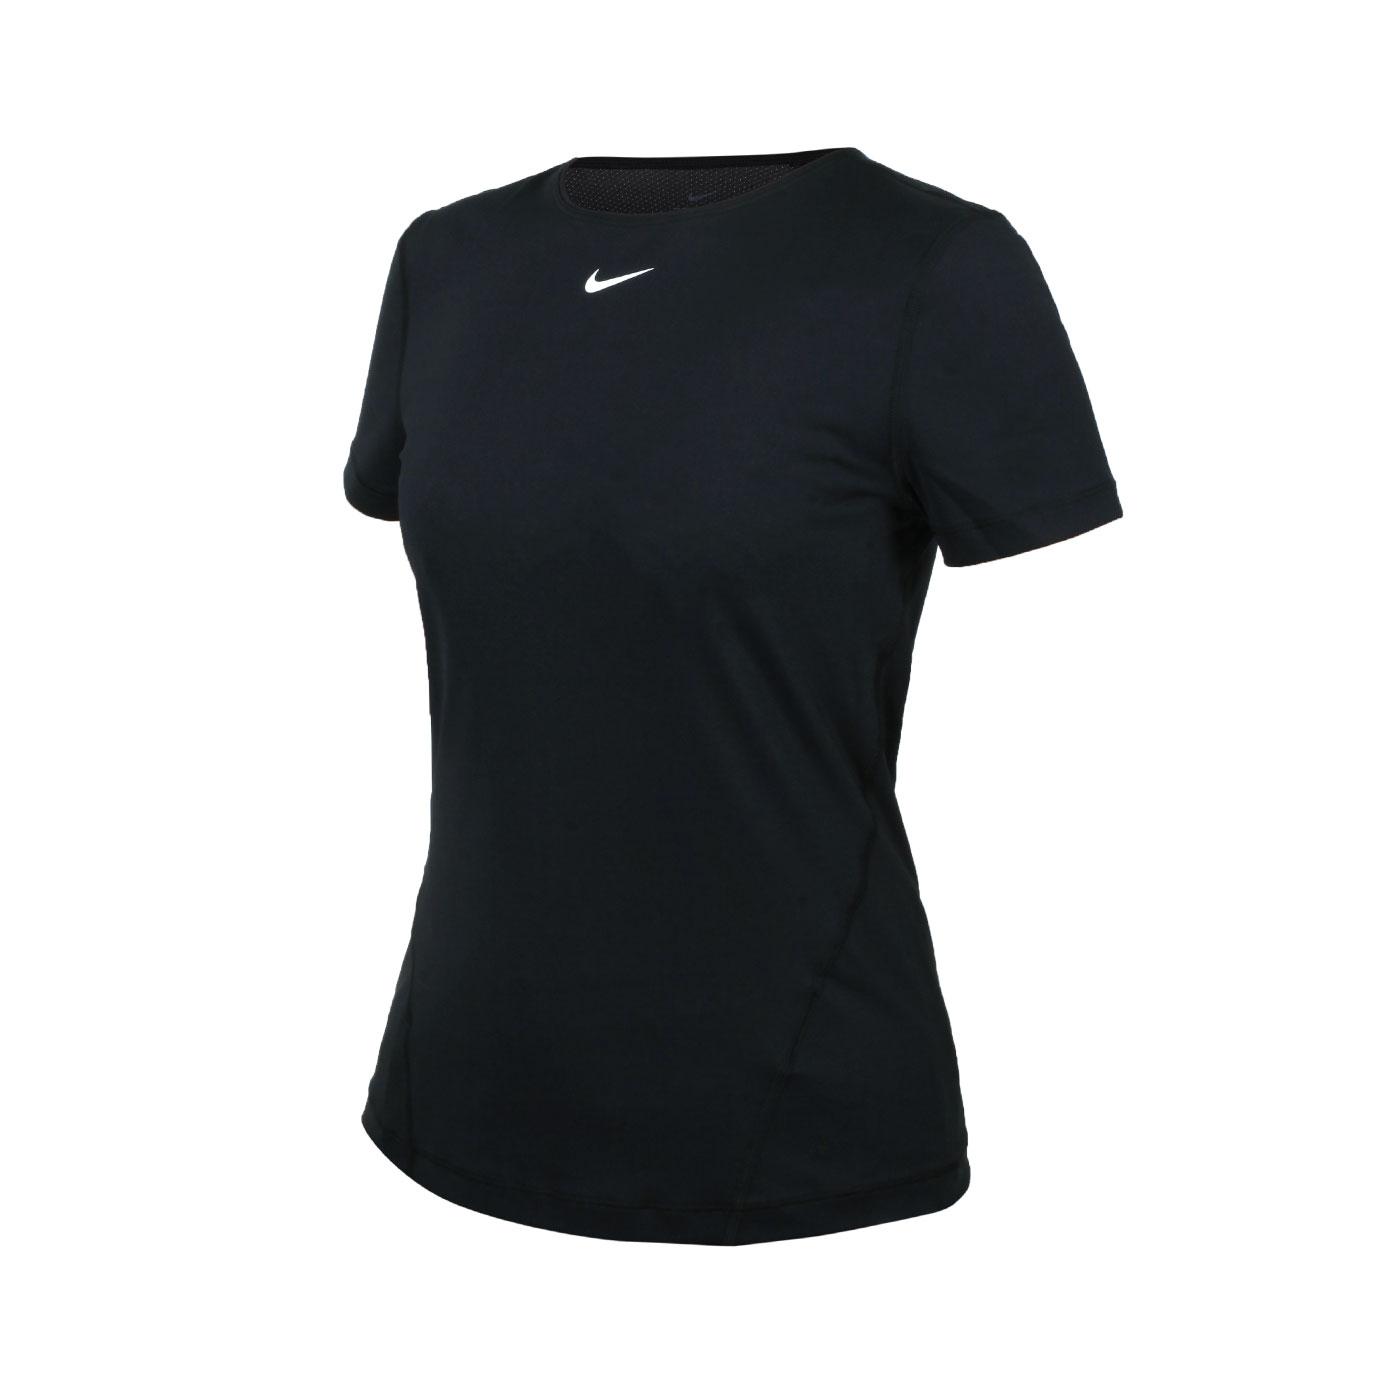 NIKE 女款短袖T恤 AO9952-010